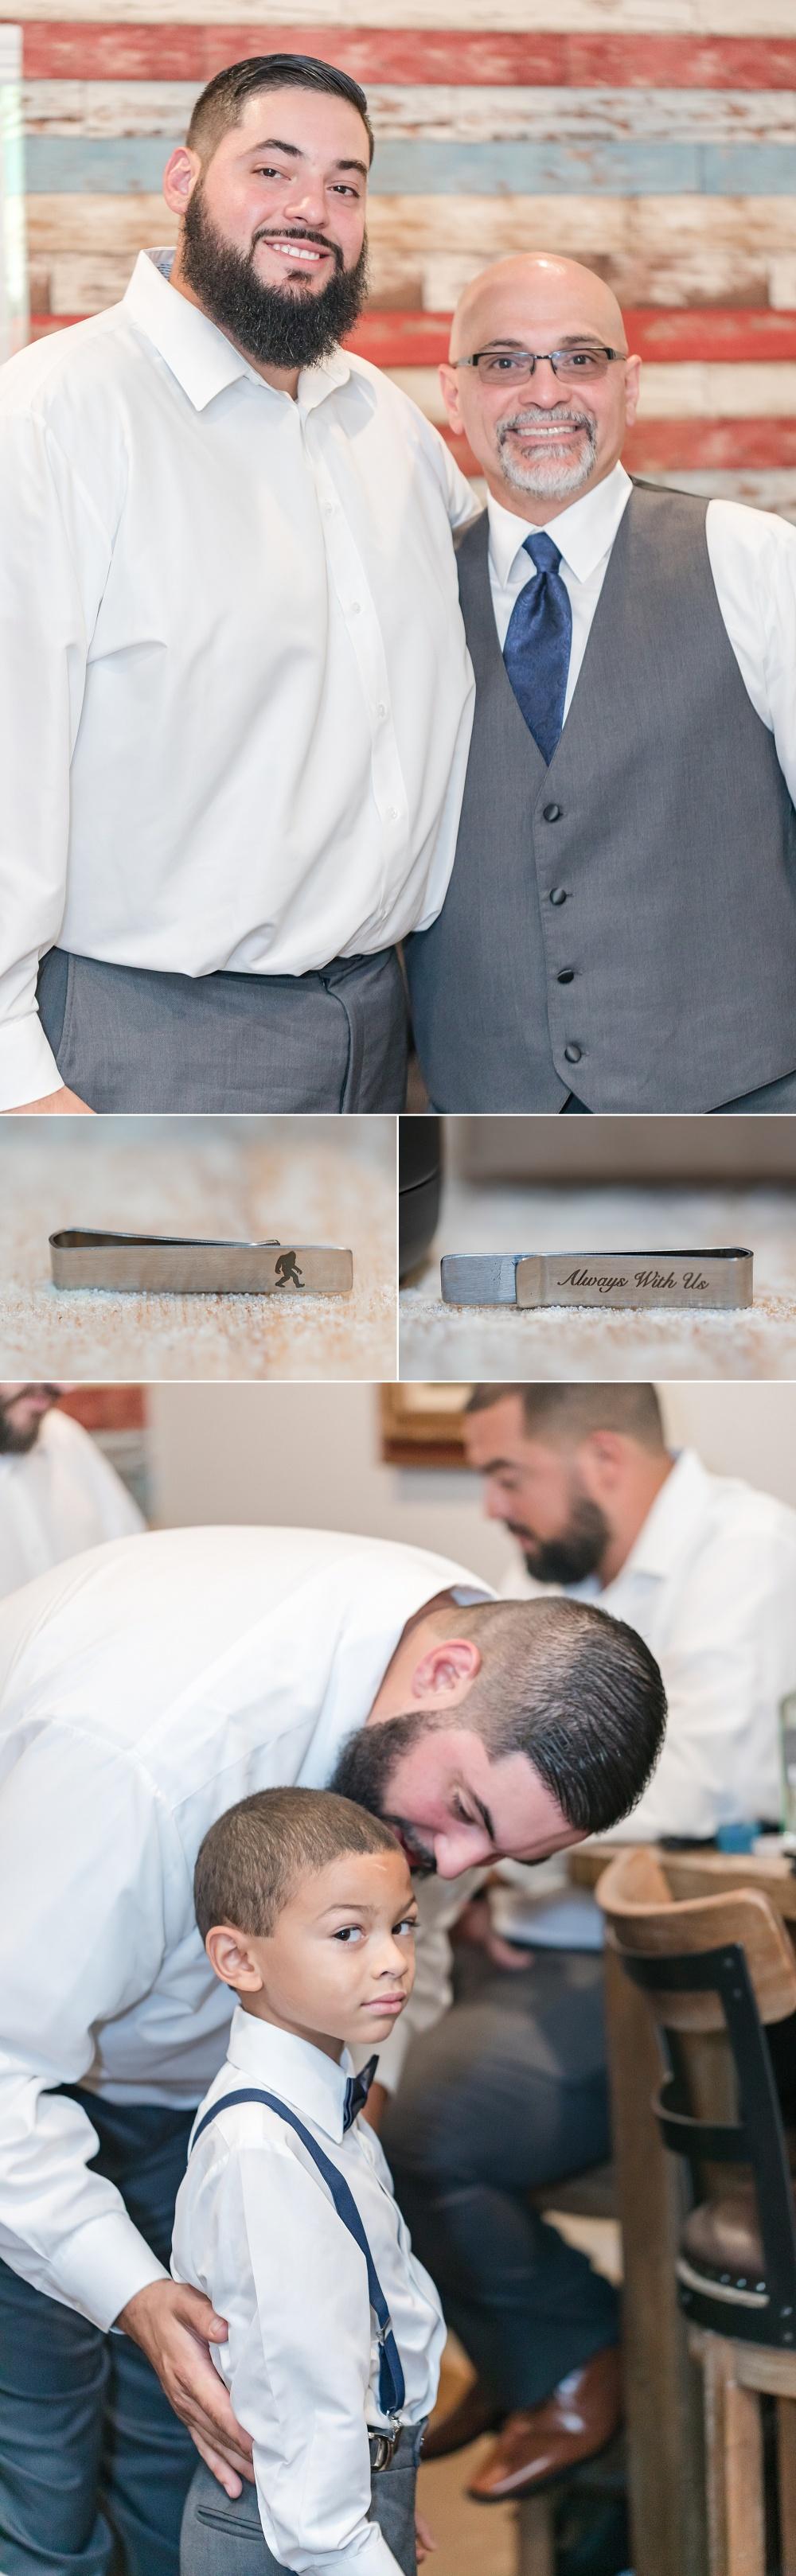 Wedding-Photographer-Bulverde-Texas-Western-Sky-Event-Venue-Carly-Barton-Photography_0019.jpg